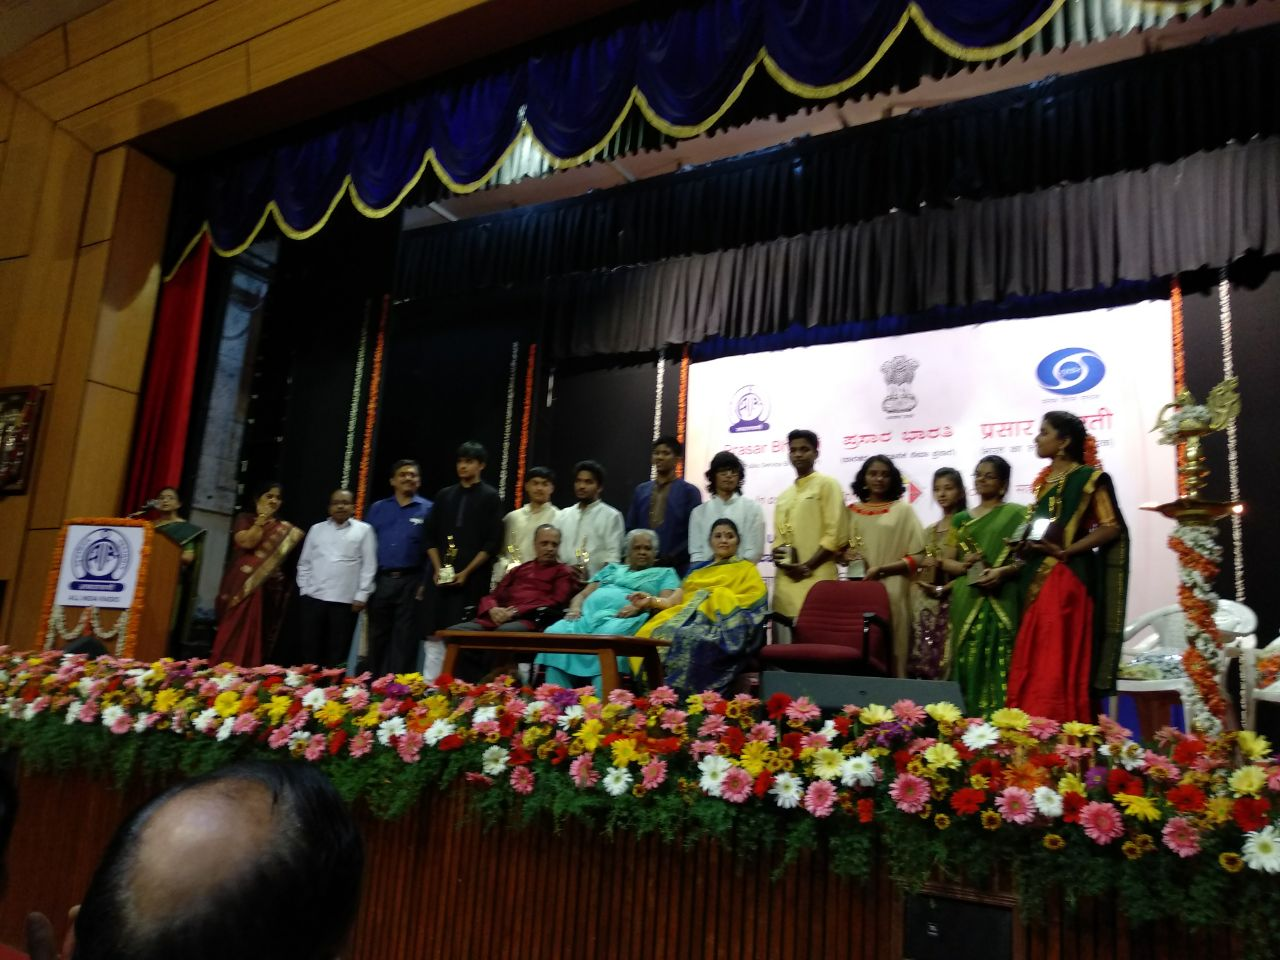 India Daily Eye: AIR Bengaluru organized Prize Distribution